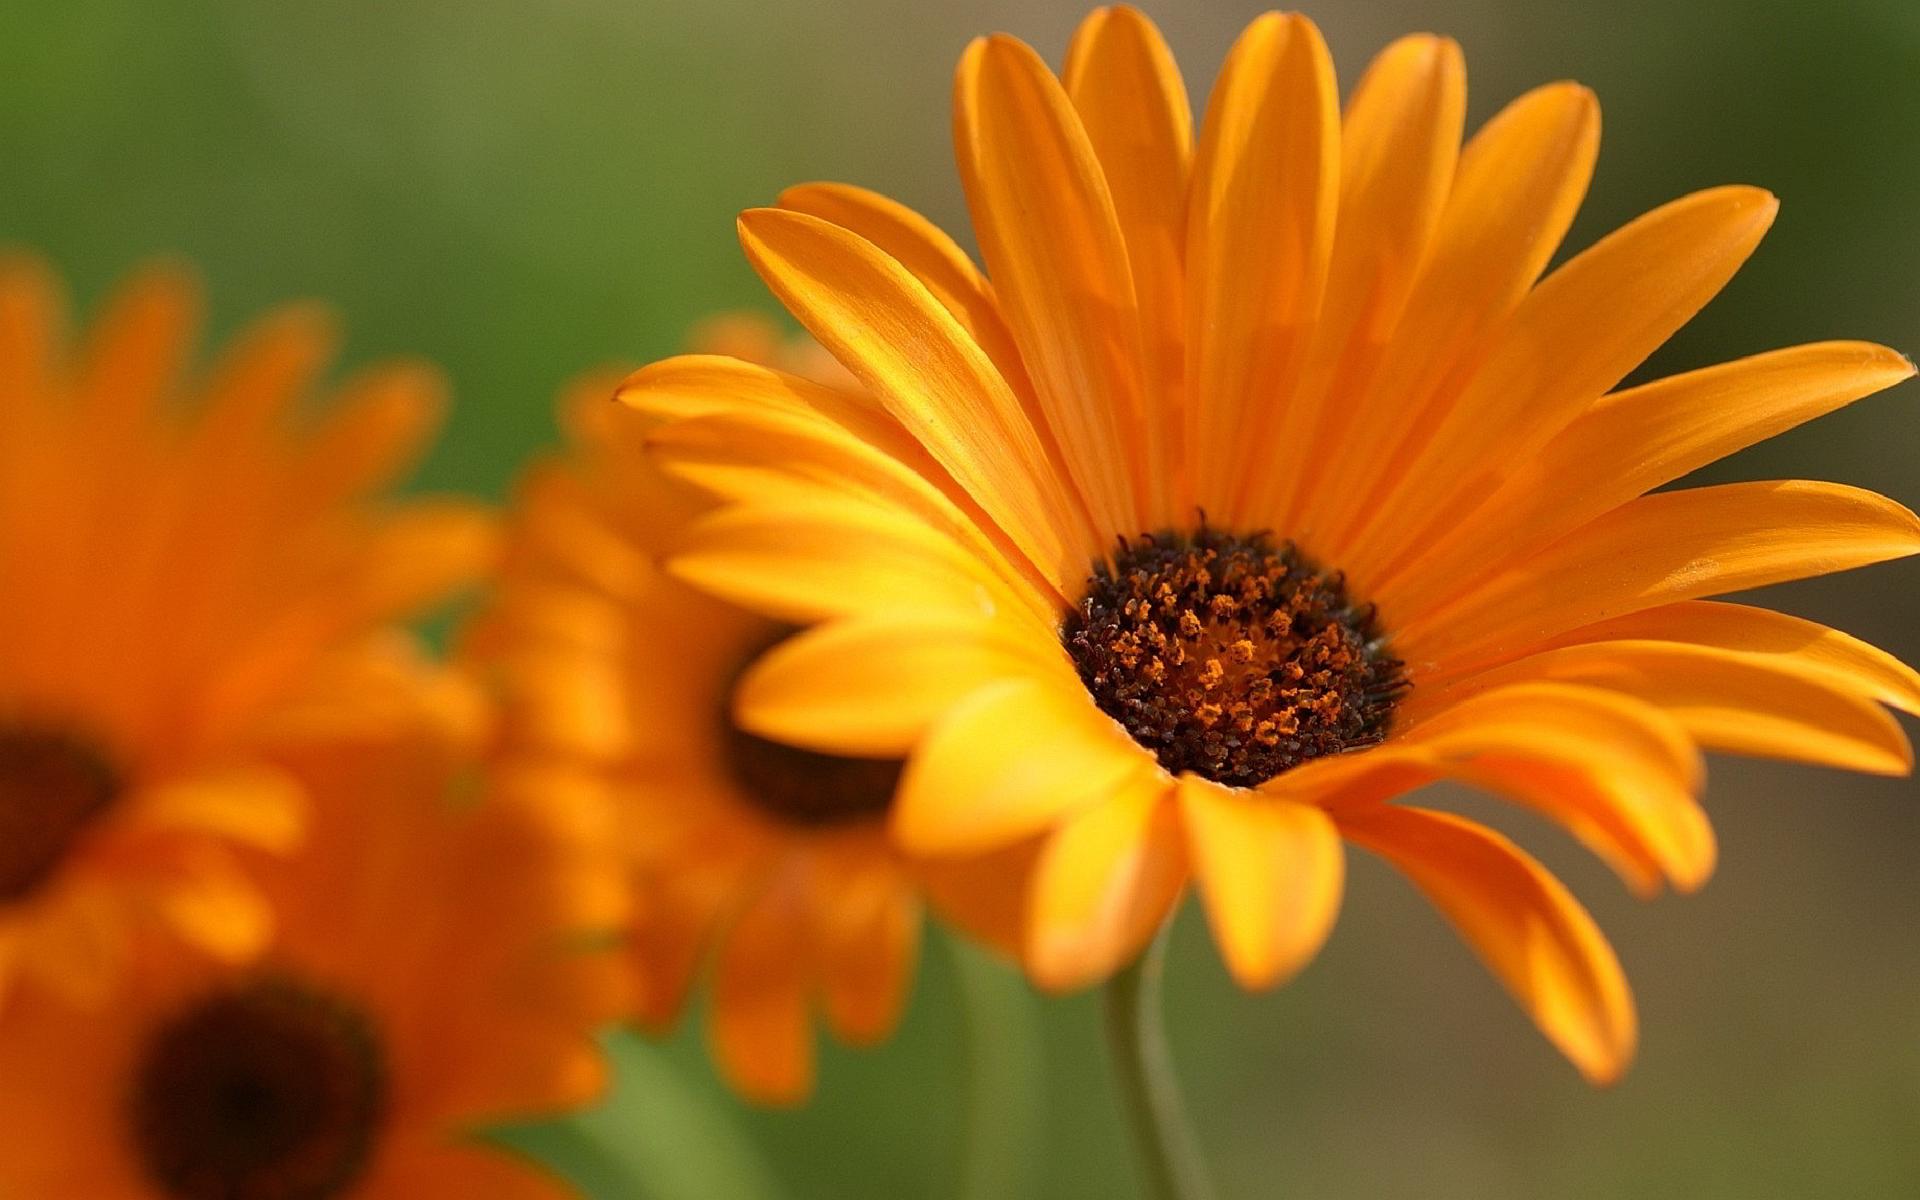 Islamic 3d Wallpapers Screensavers Flower Orange Petals Macro Hd Desktop Wallpapers 4k Hd